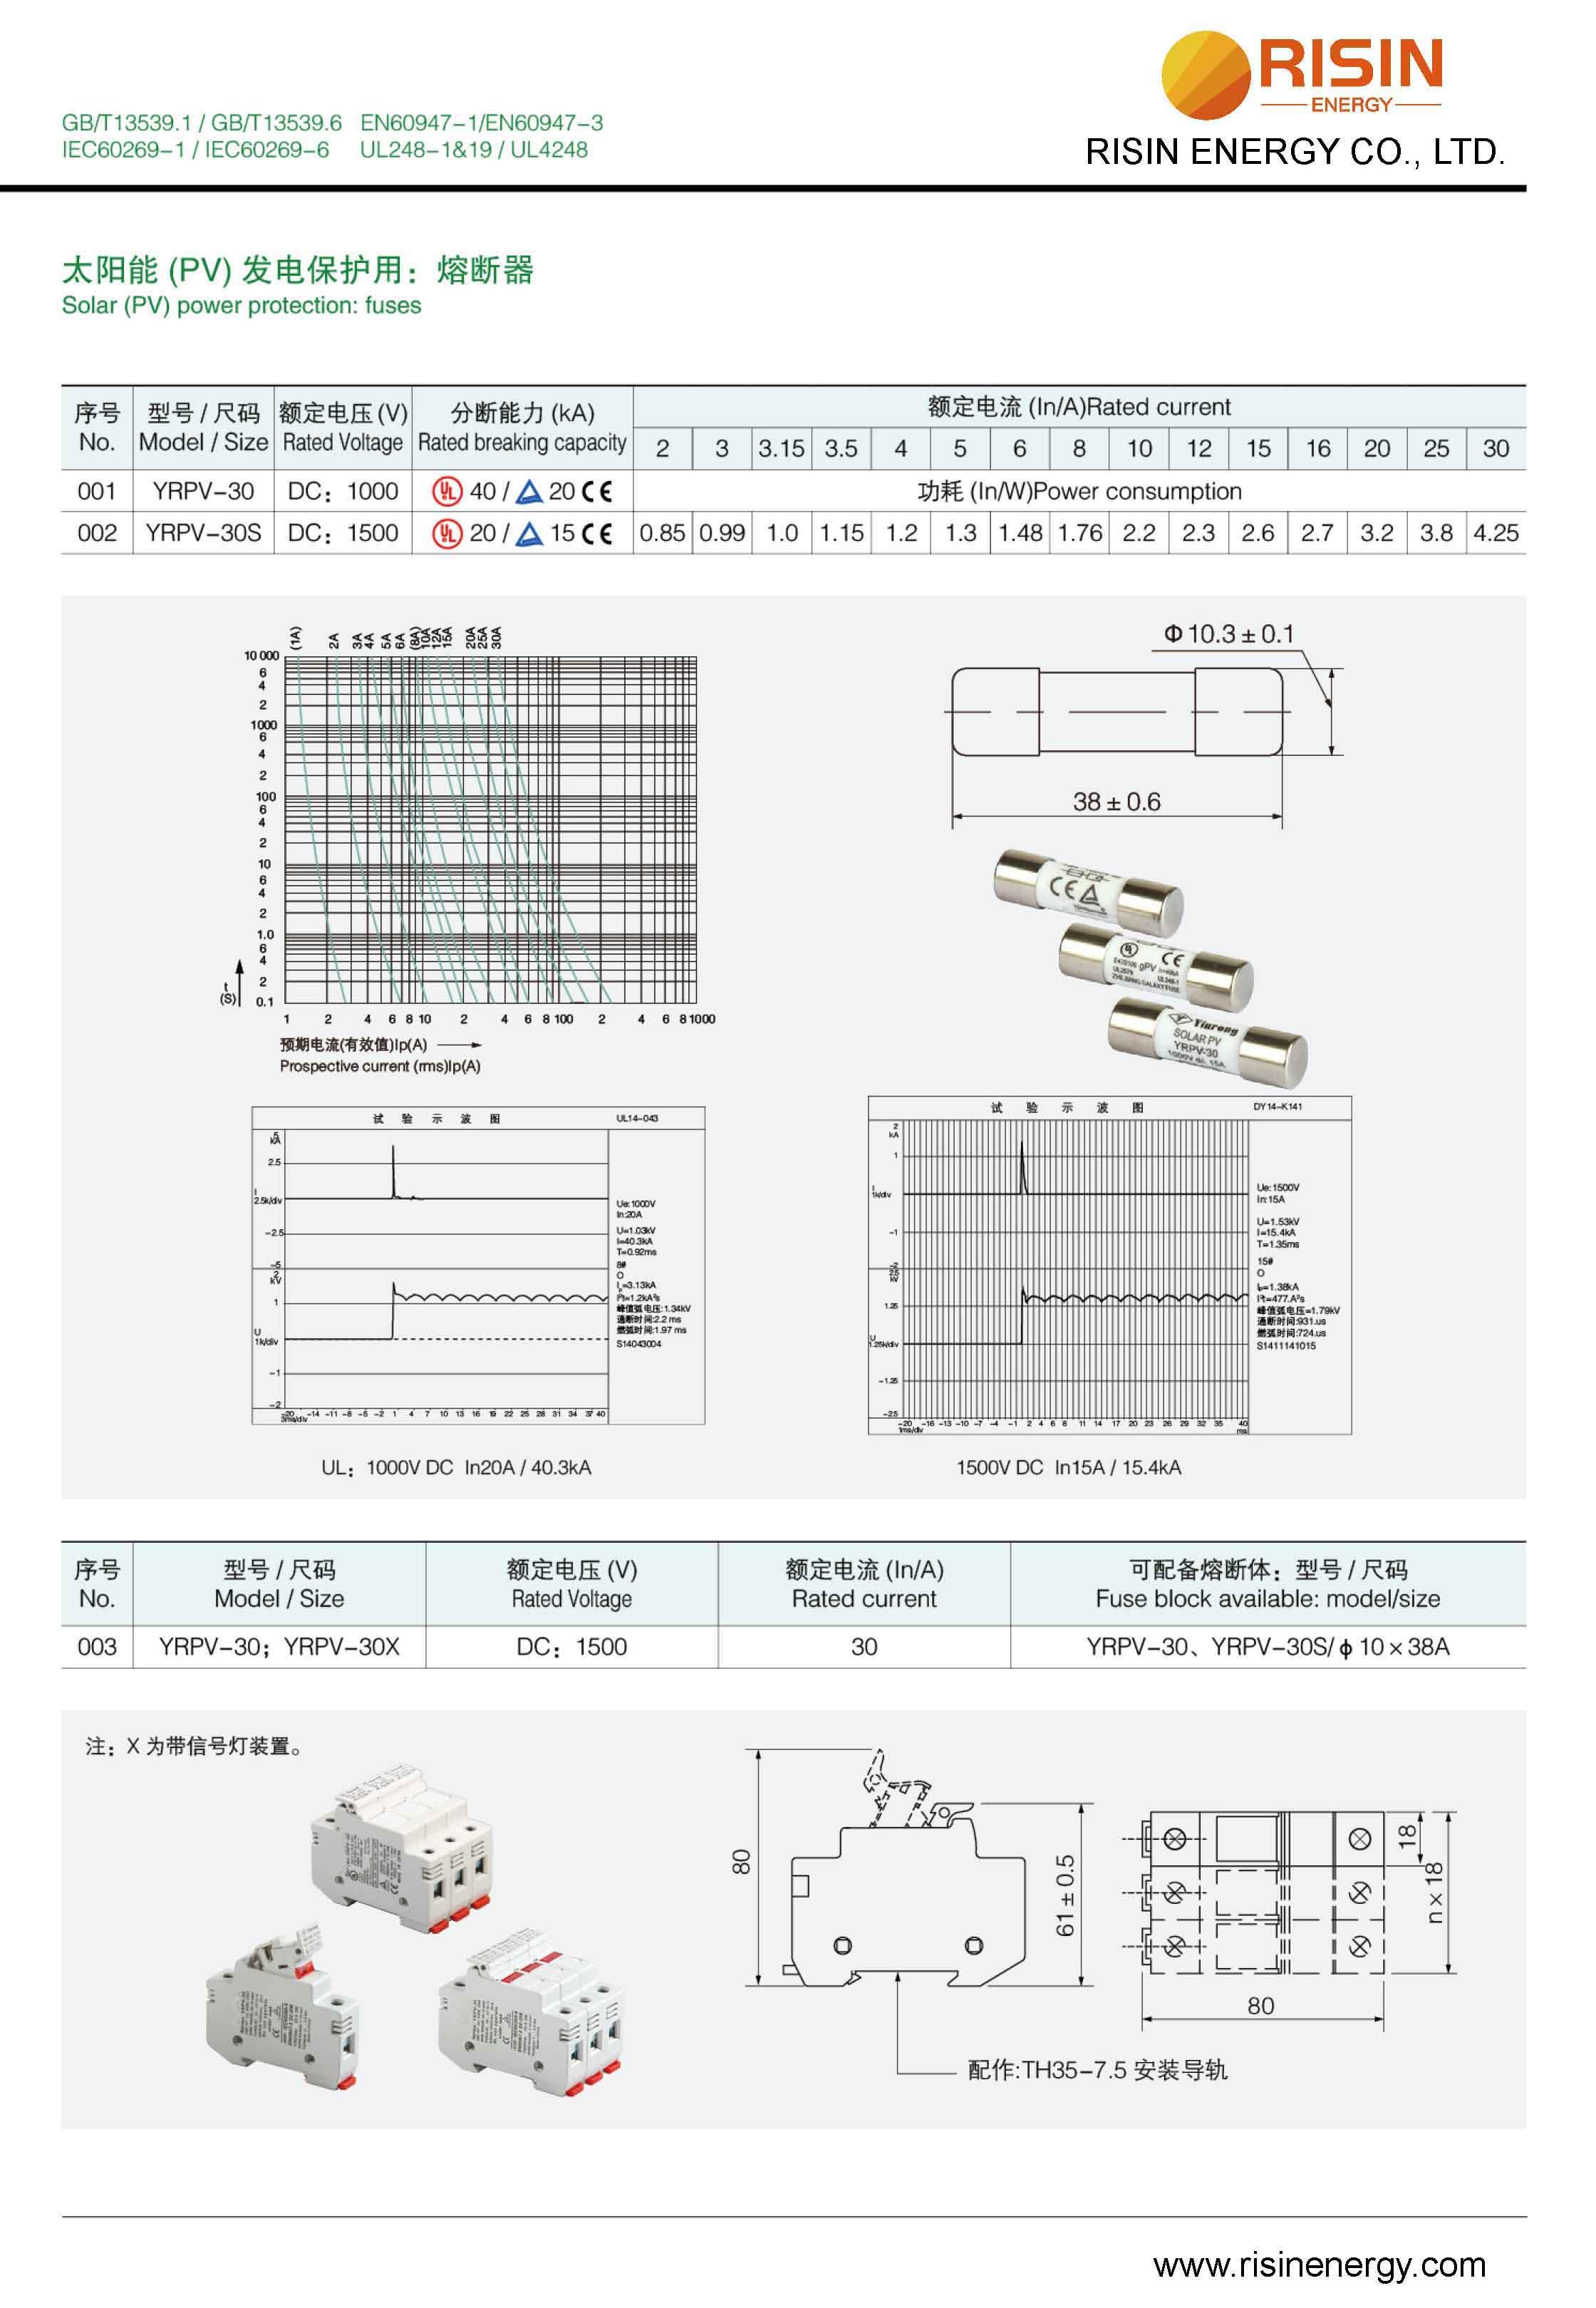 10x38mm 1000V Solar Fuse and Holder